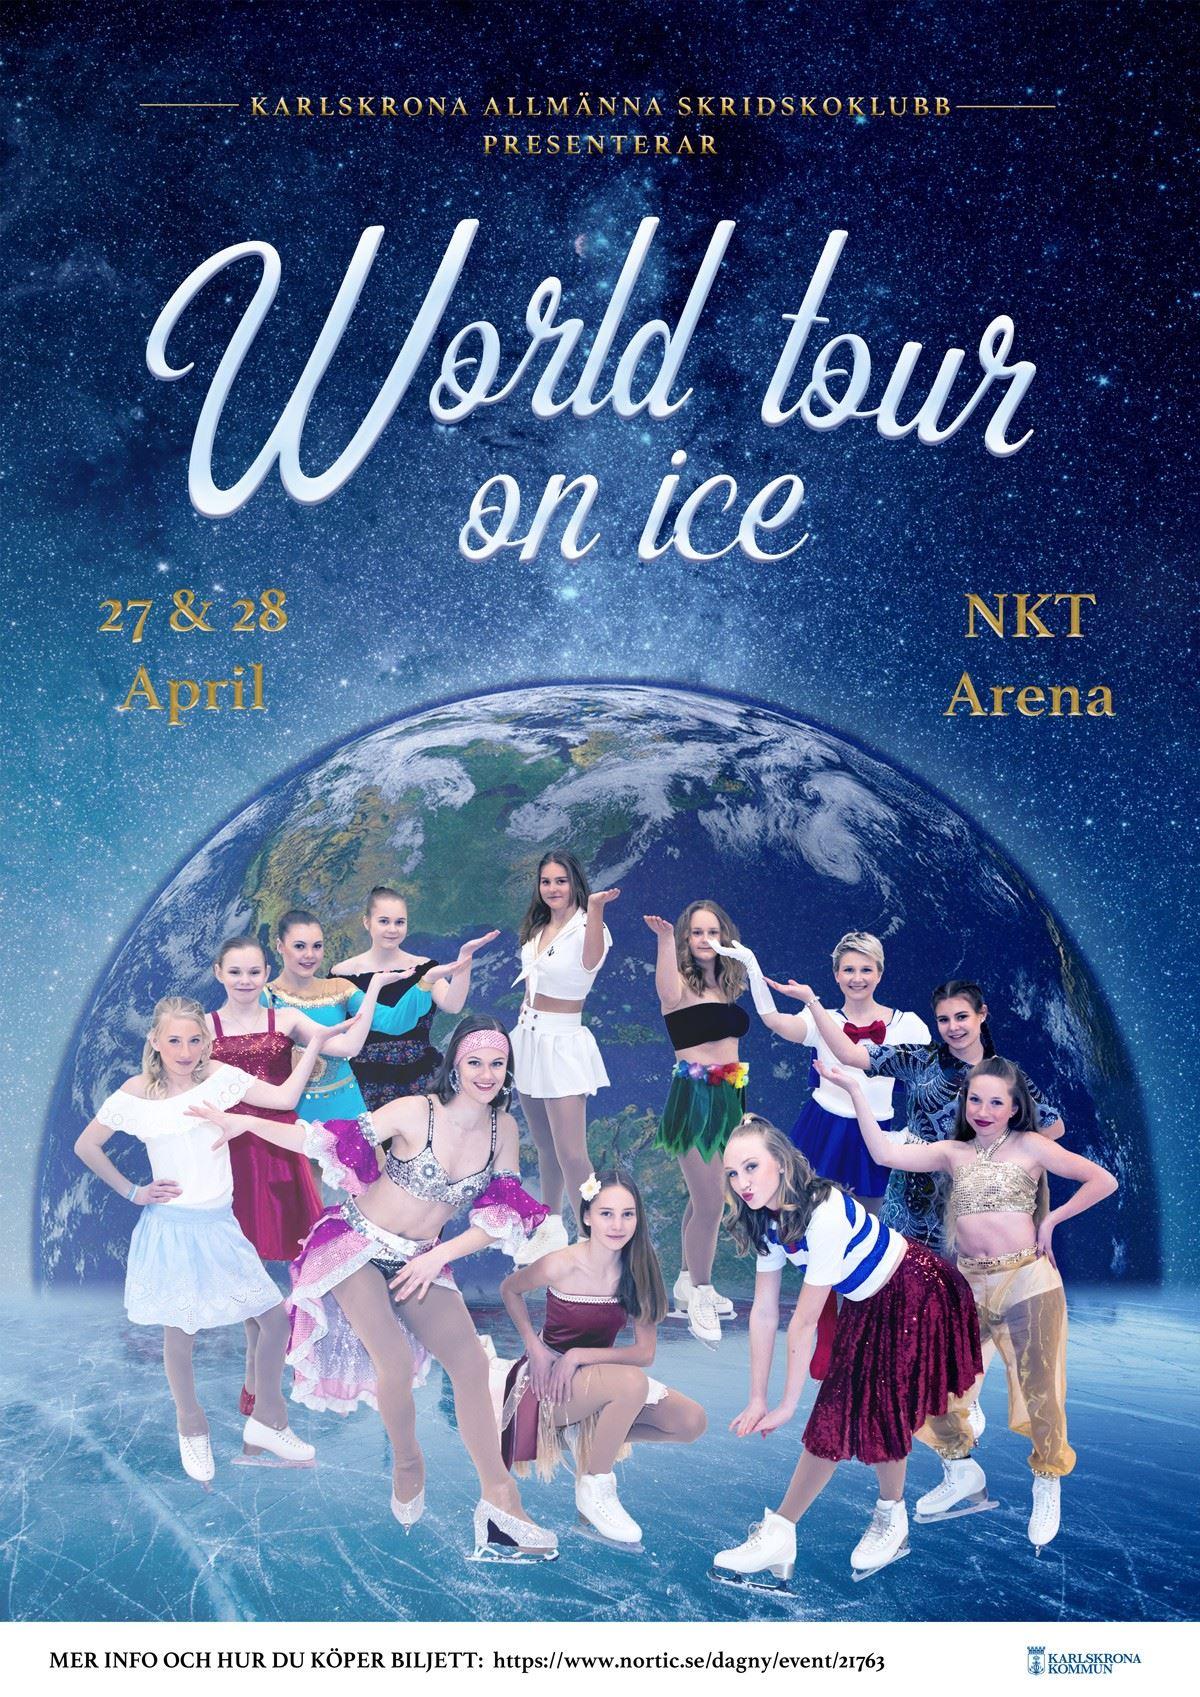 World tour on ice - Karlskrona General Skating Club